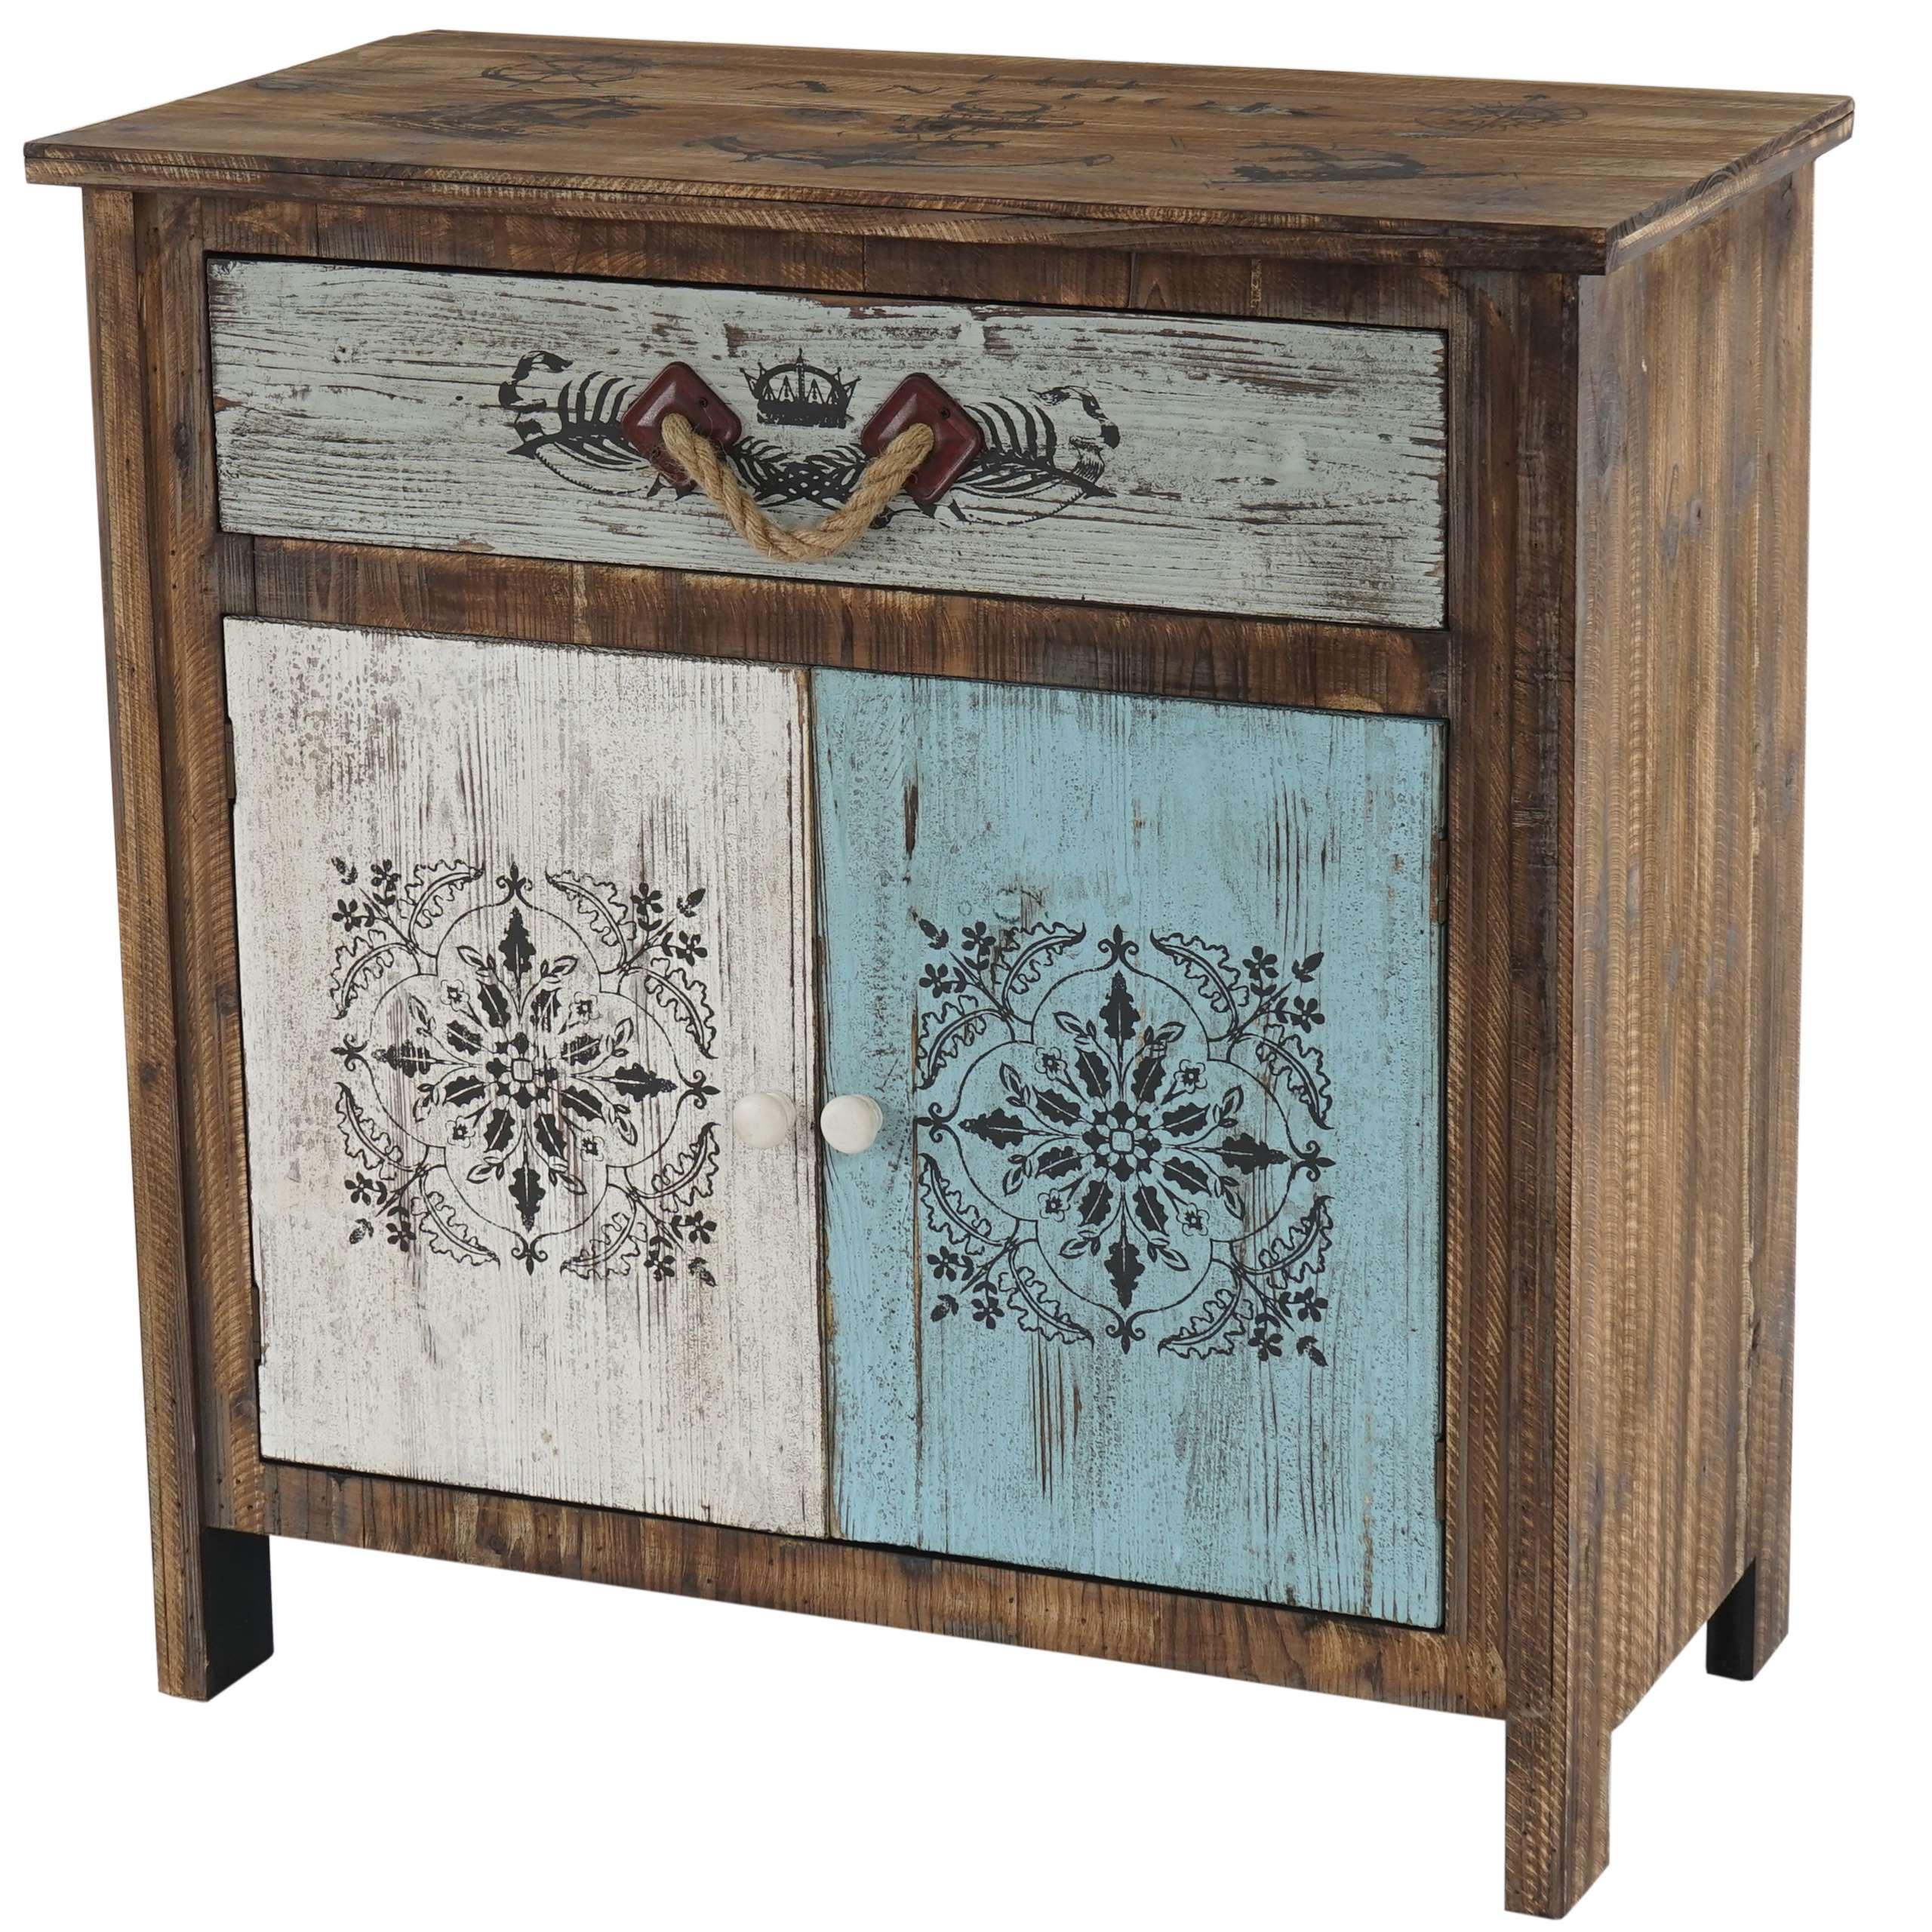 kommode funchal schubladenkommode schrank shabby look. Black Bedroom Furniture Sets. Home Design Ideas